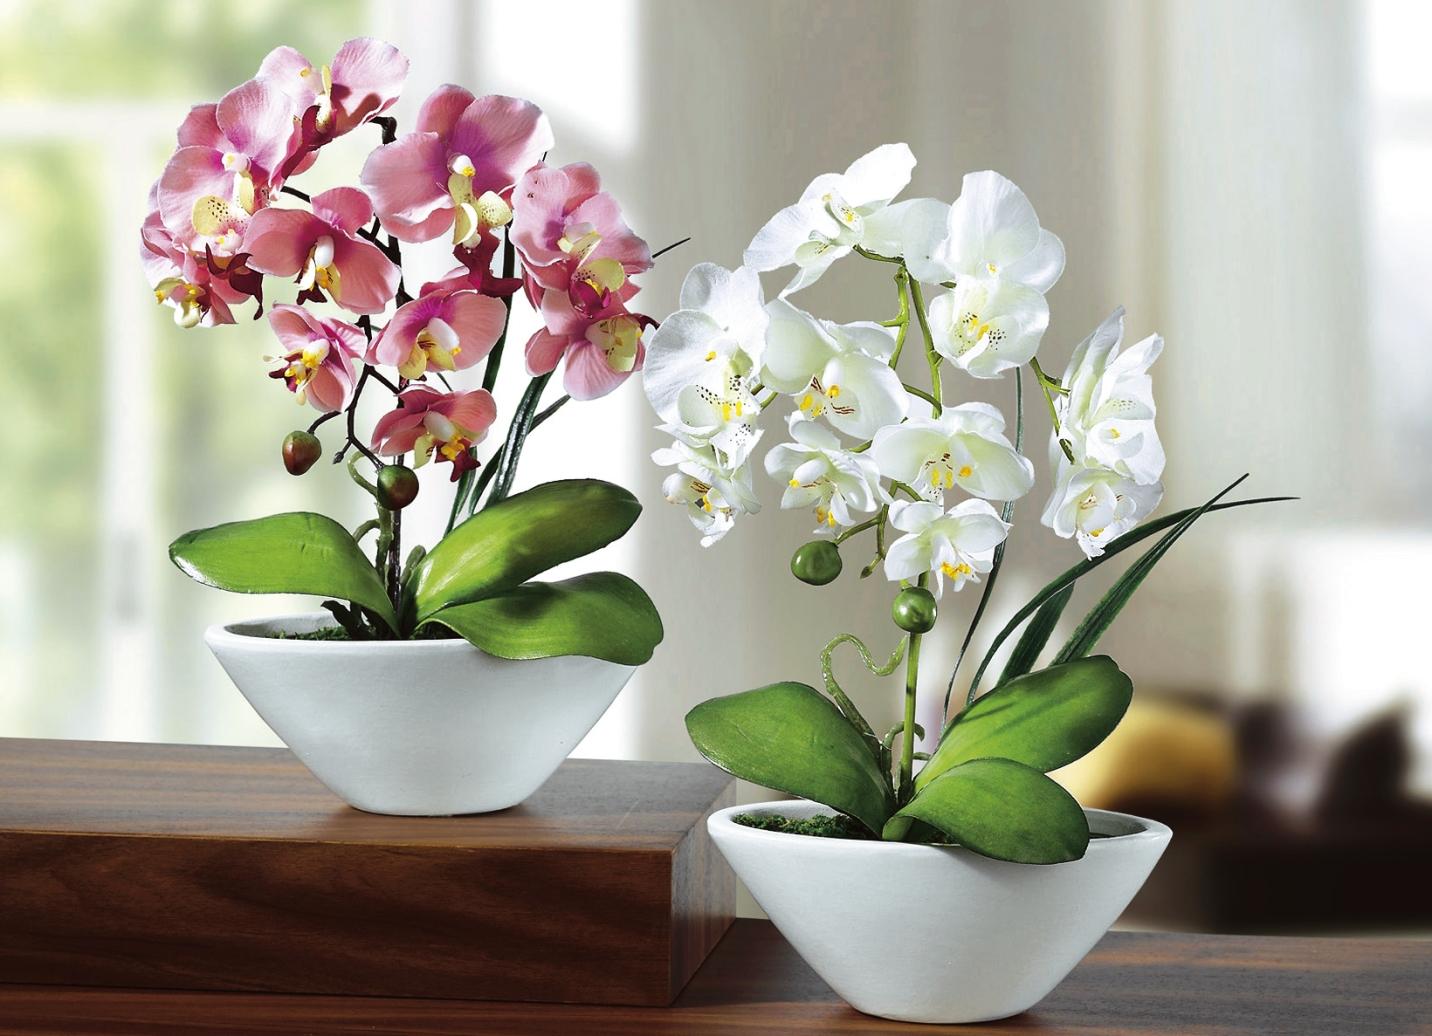 Orchideen 2er set kunst textilpflanzen bader - Duschvorhang mit orchideen ...